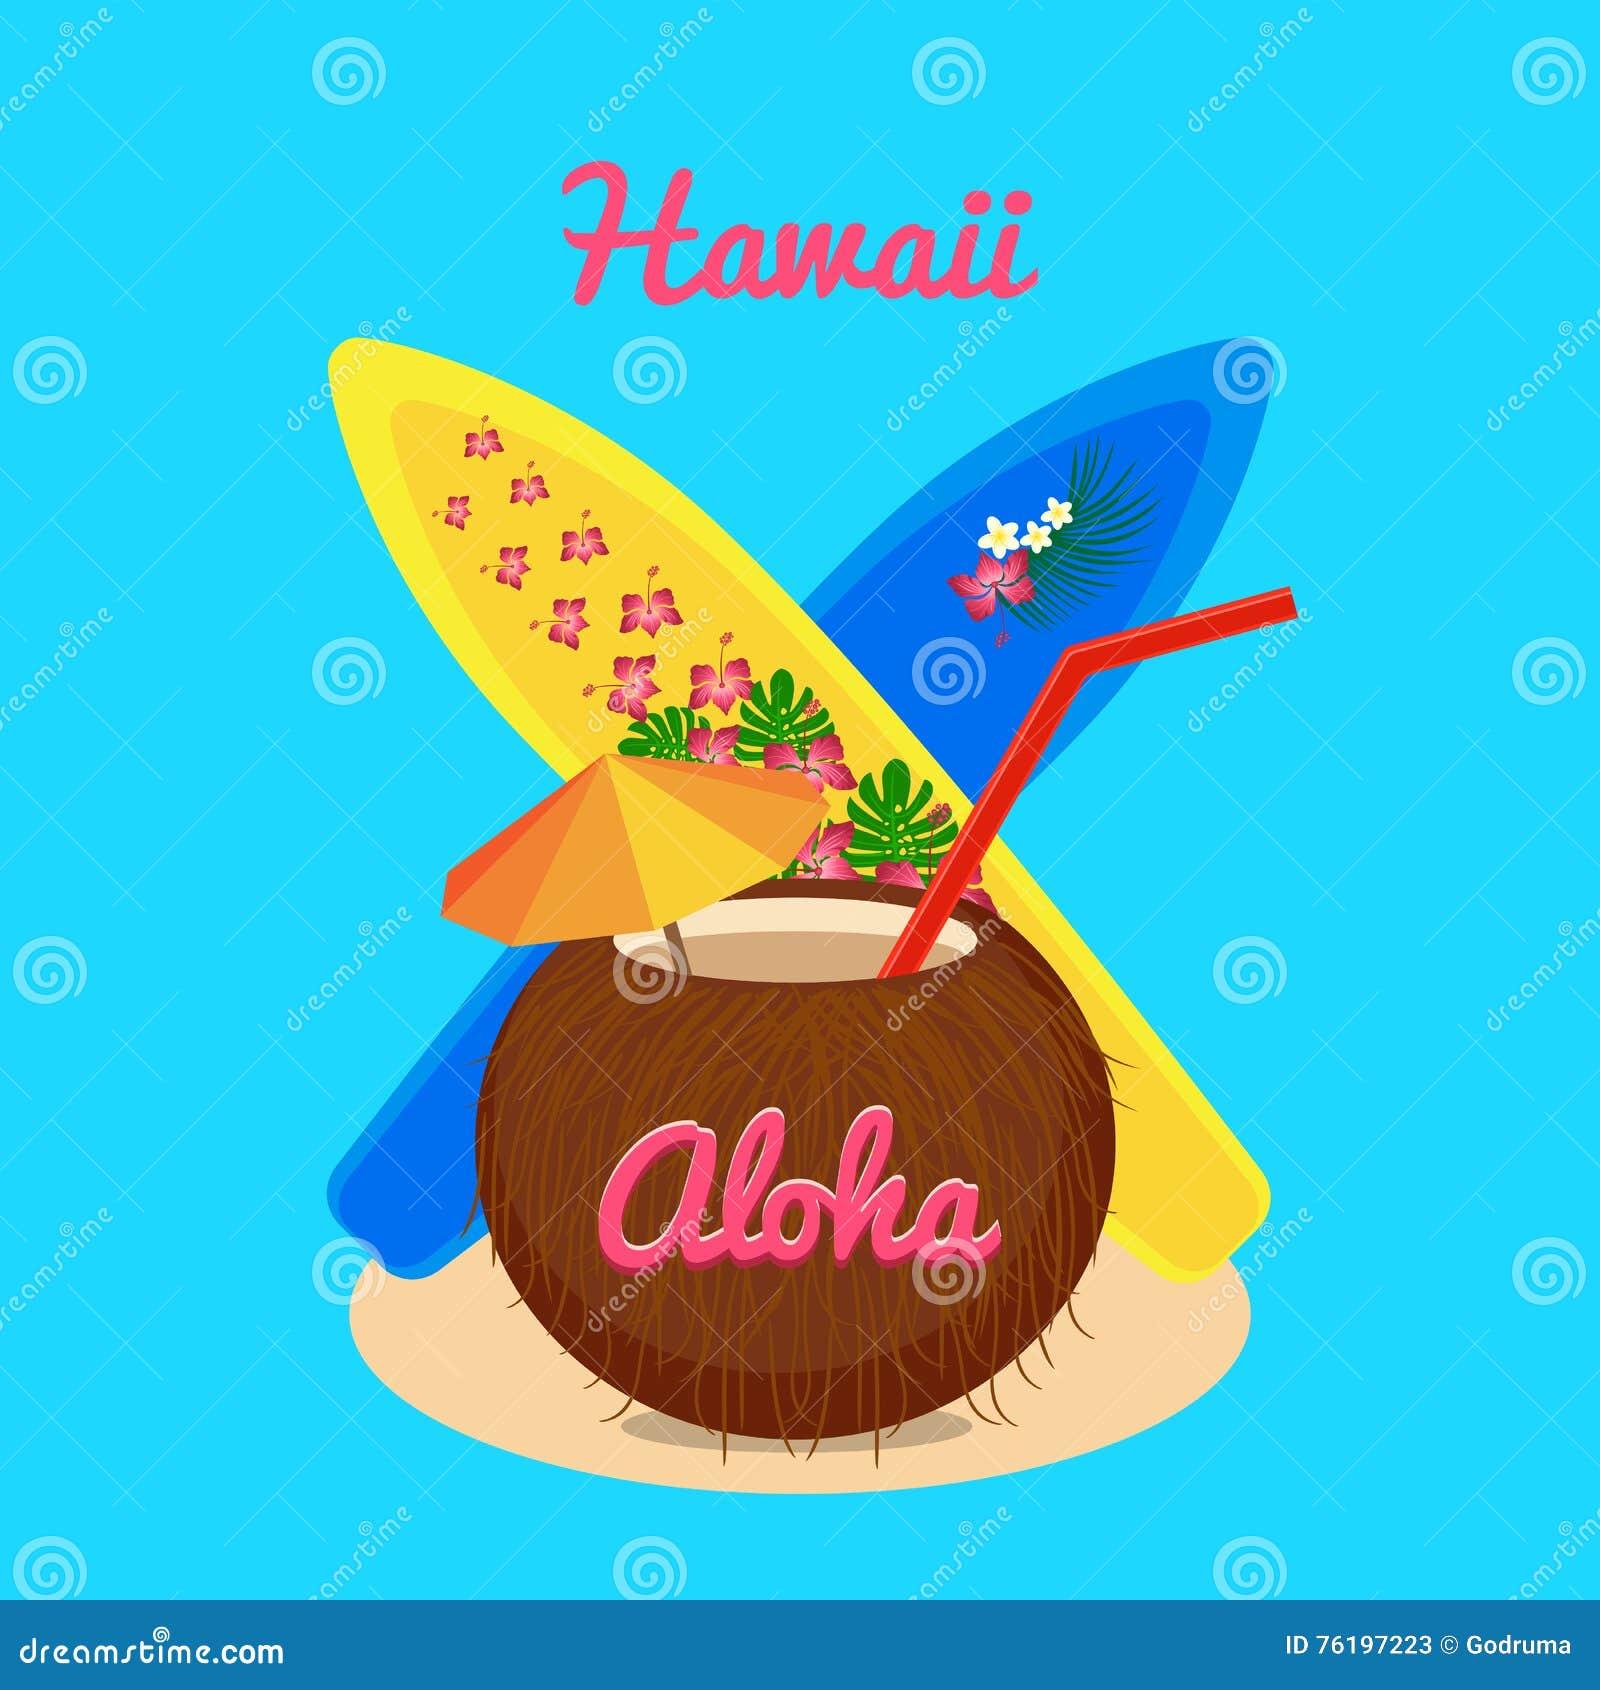 cf132bdeb Aloha Hawaii Carefree Happy Life, Vector Illustration Stock Vector ...